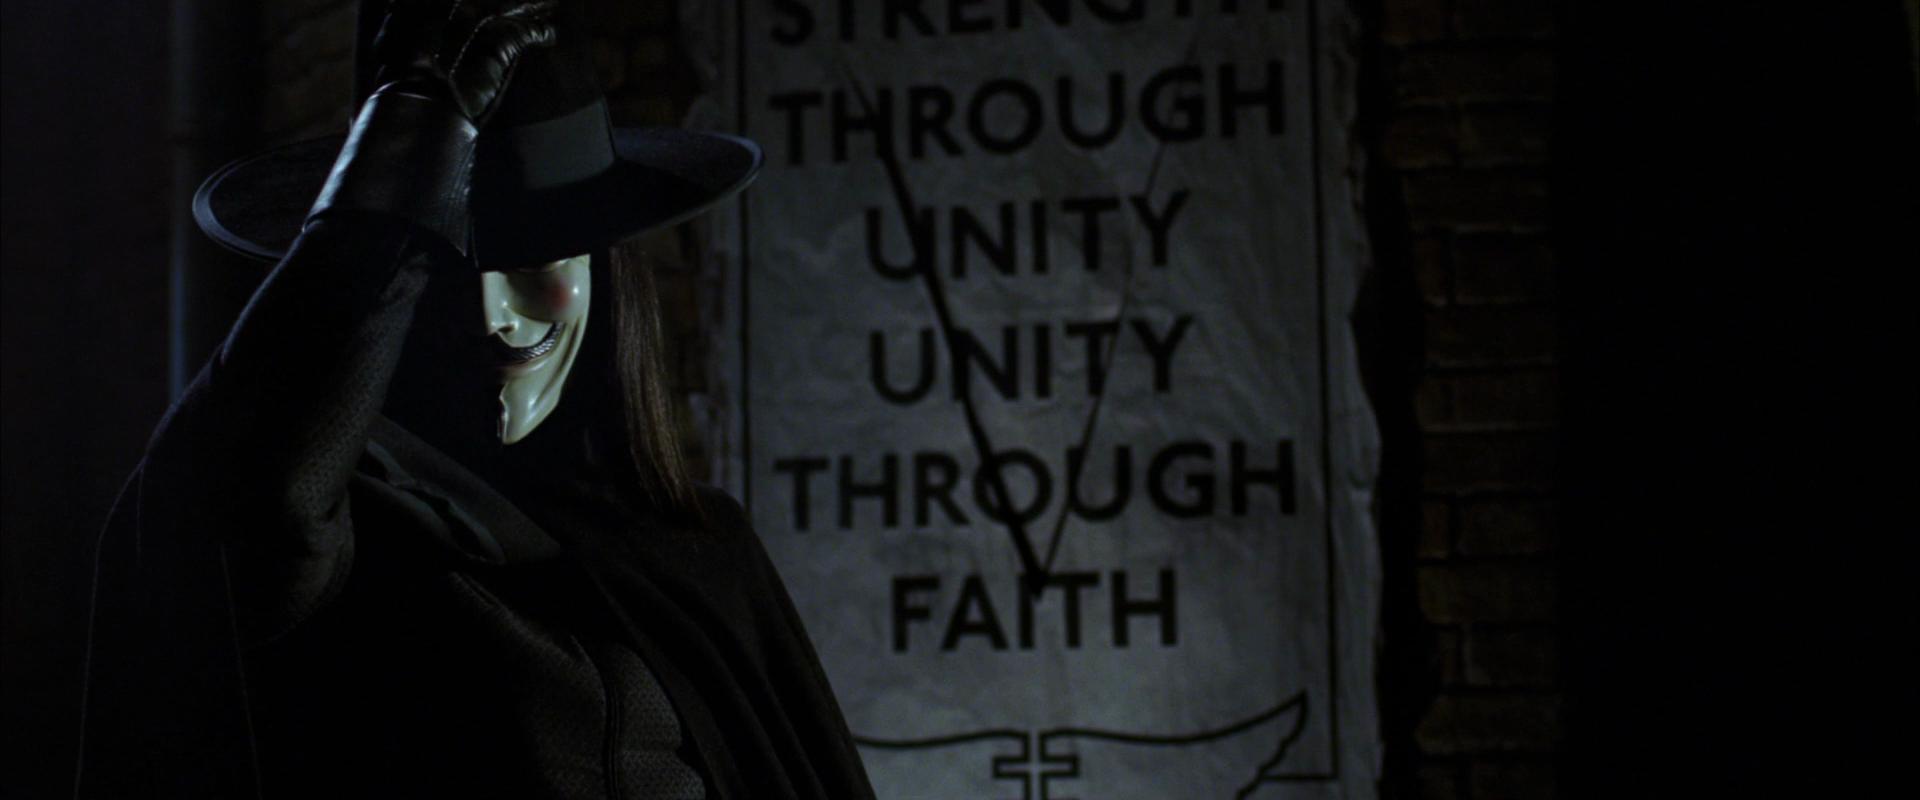 V for Vendetta Essay - Part 4